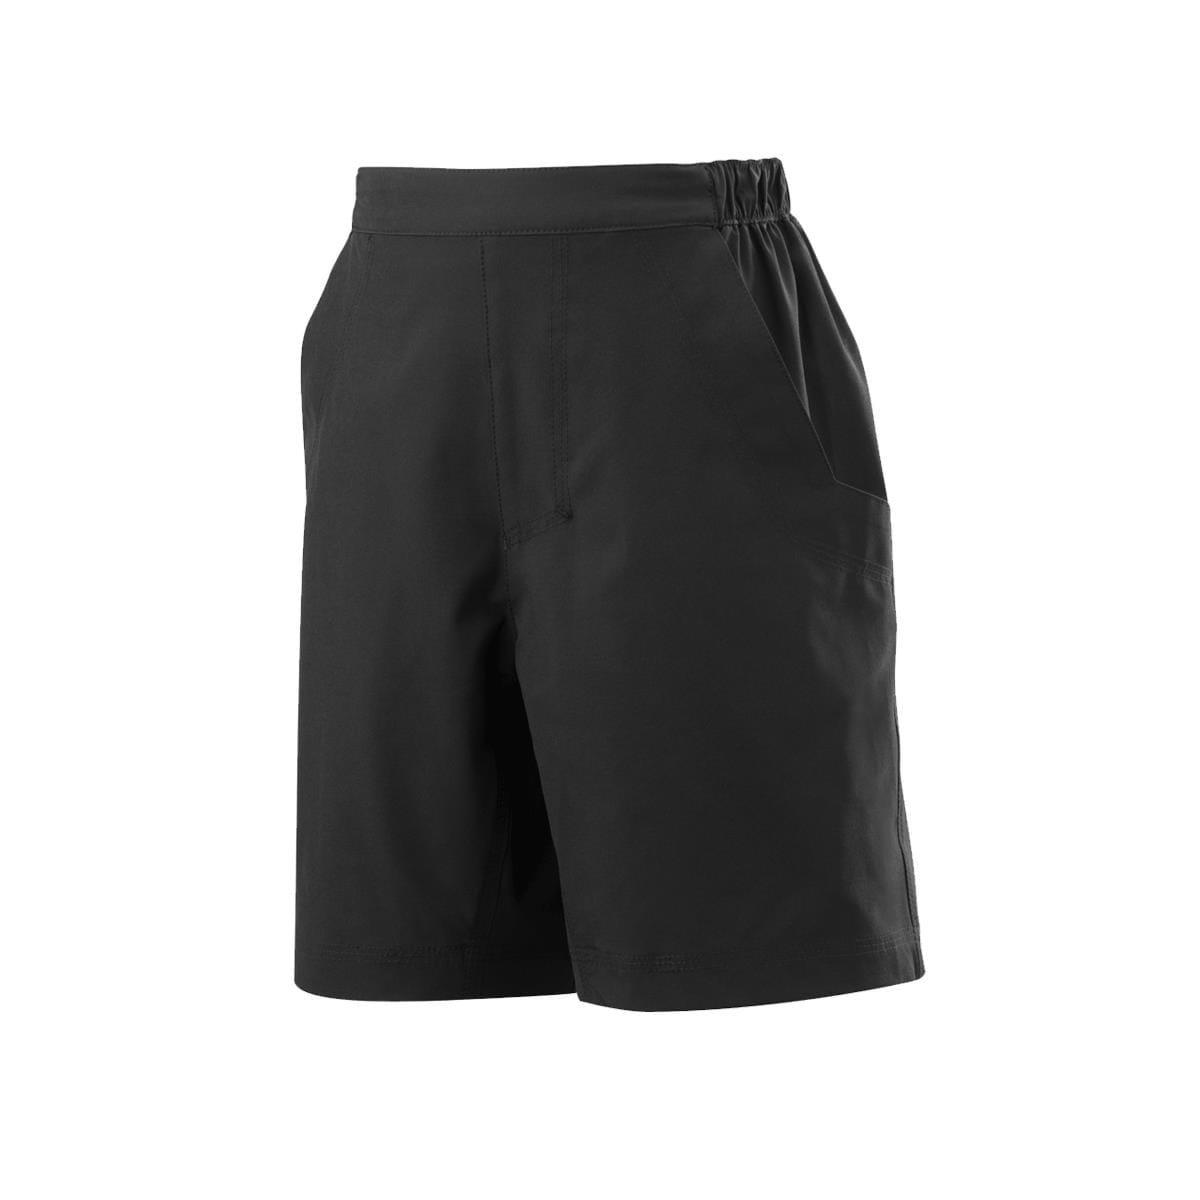 Kids Baggy Shorts